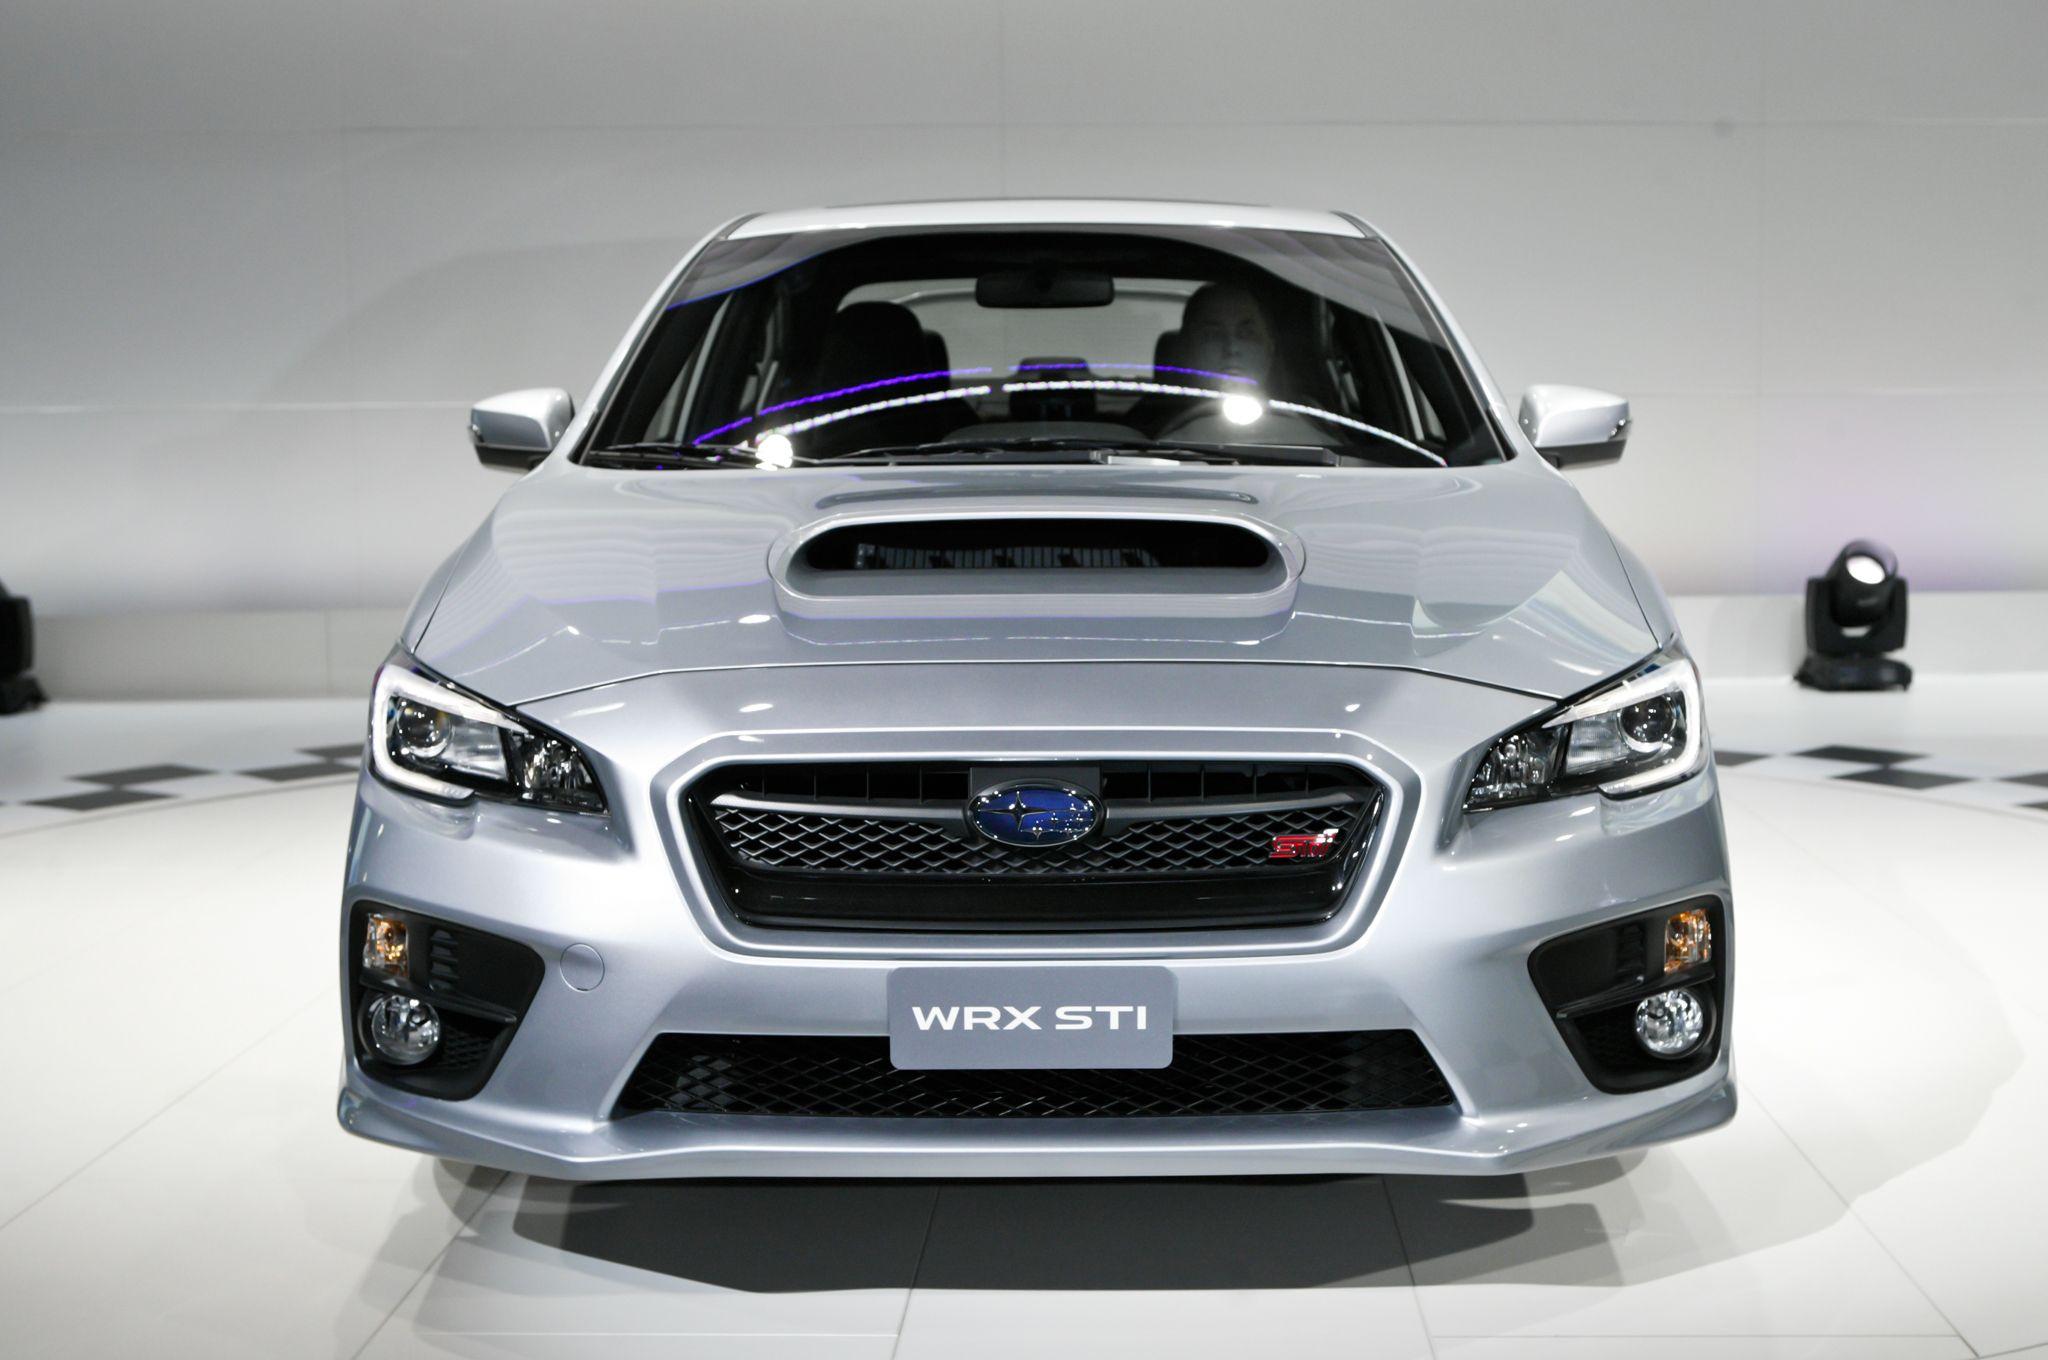 2015 Subaru WRX STI Front Three Quarter 03 25